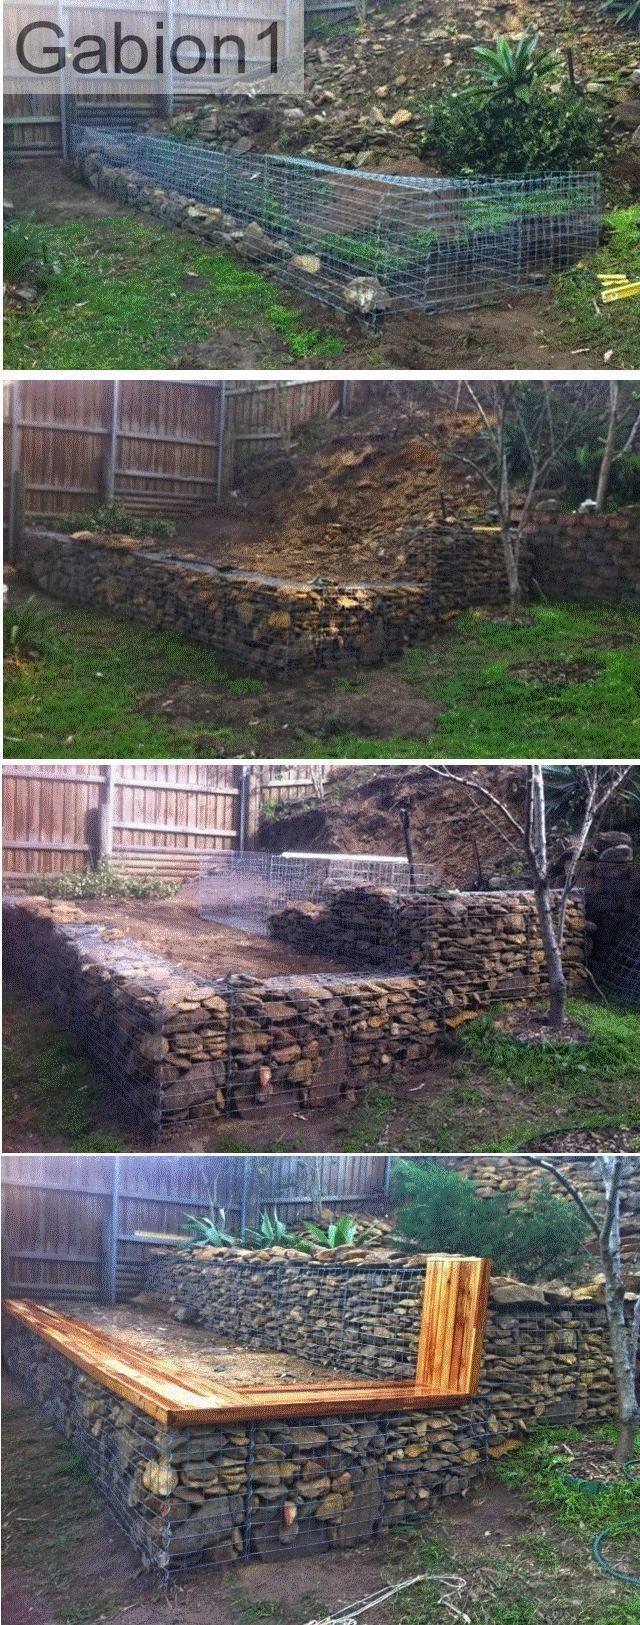 stepped gabion garden retaining wall http://www.gabion1.com.au: